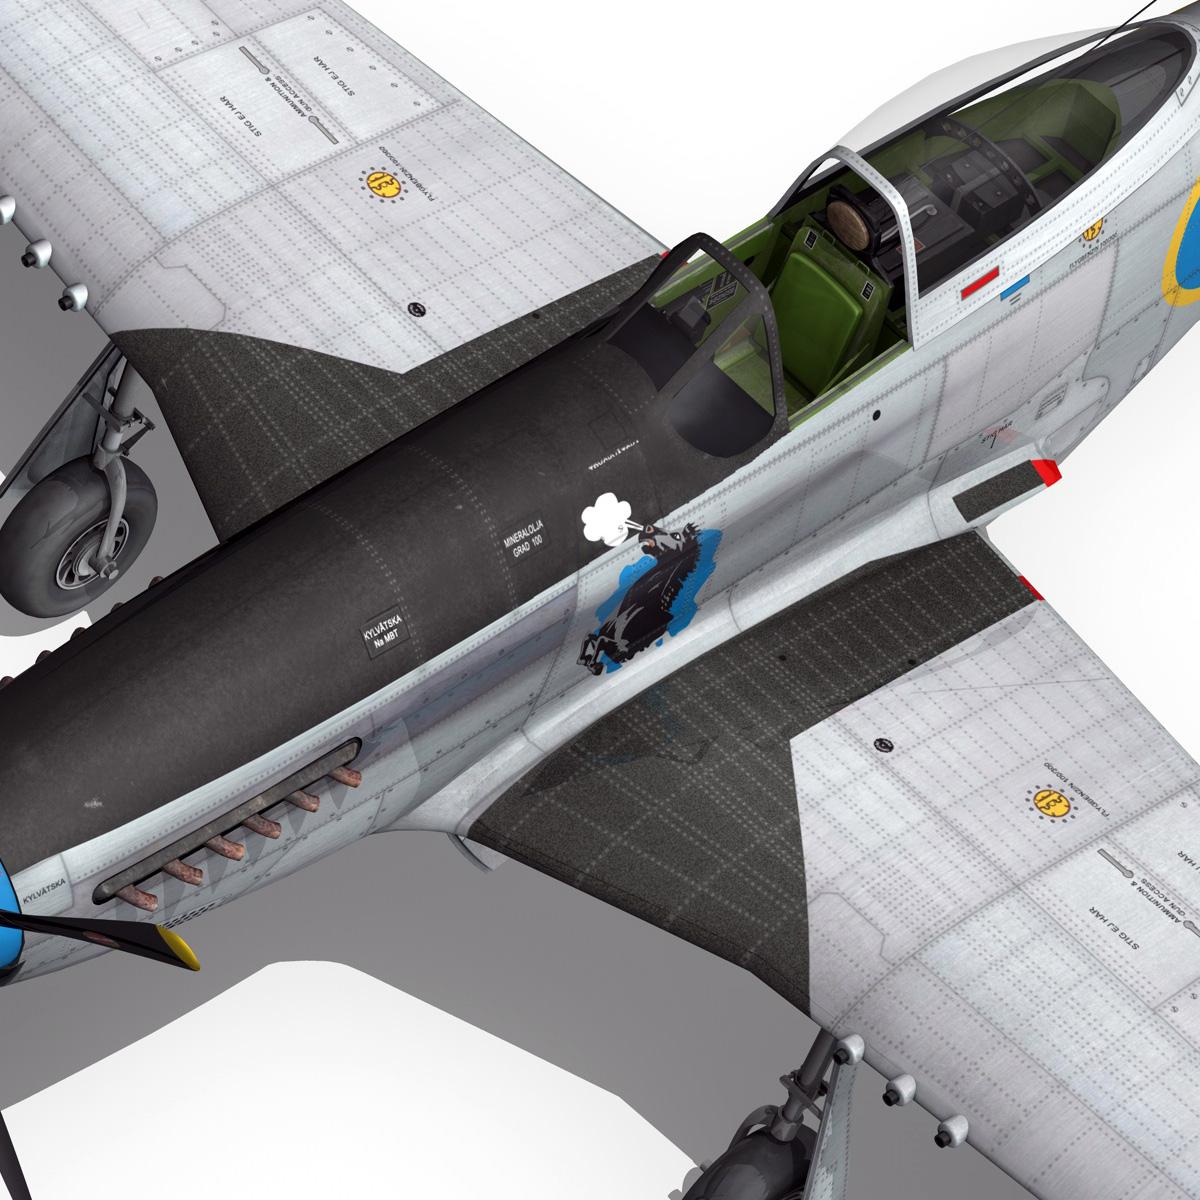 north american p-51d mustang – swedisch airforce 3d model fbx c4d lwo obj 268242